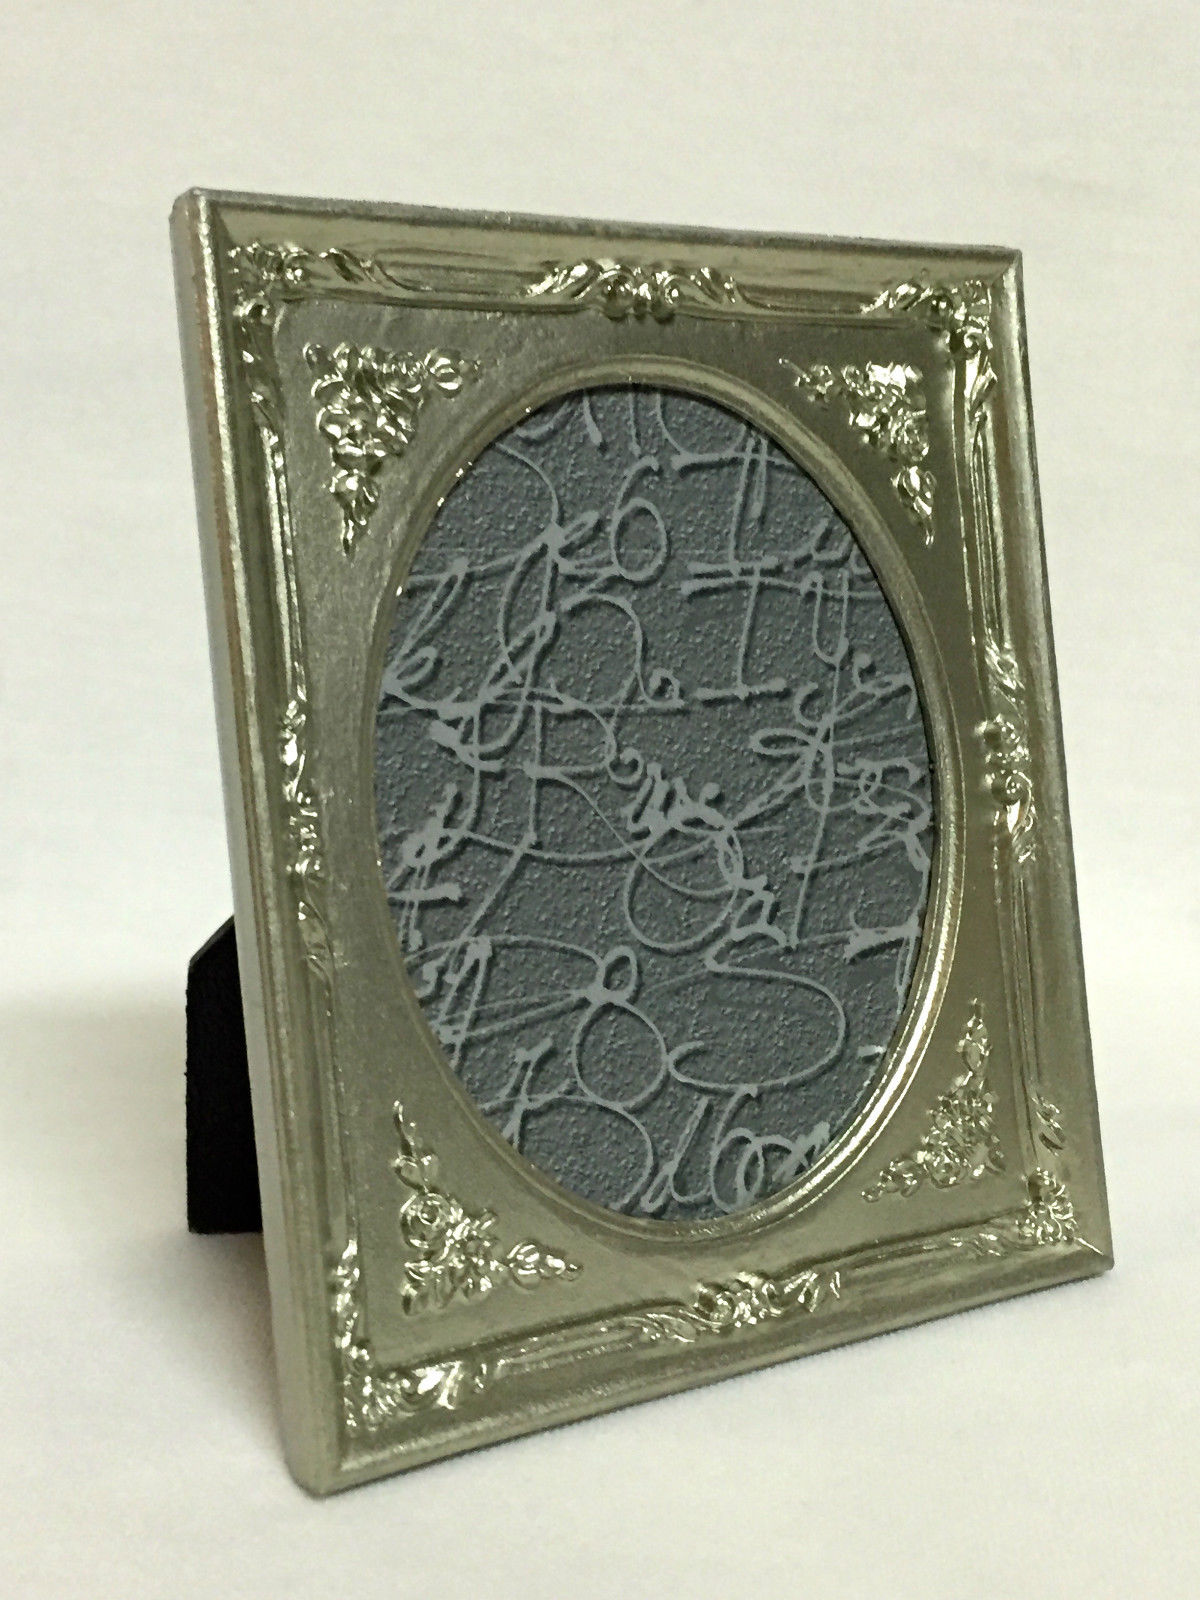 bilderrahmen antik silber oval rechteckig 13x12 barockrahmen fotorahmen c8g p kaufen bei. Black Bedroom Furniture Sets. Home Design Ideas